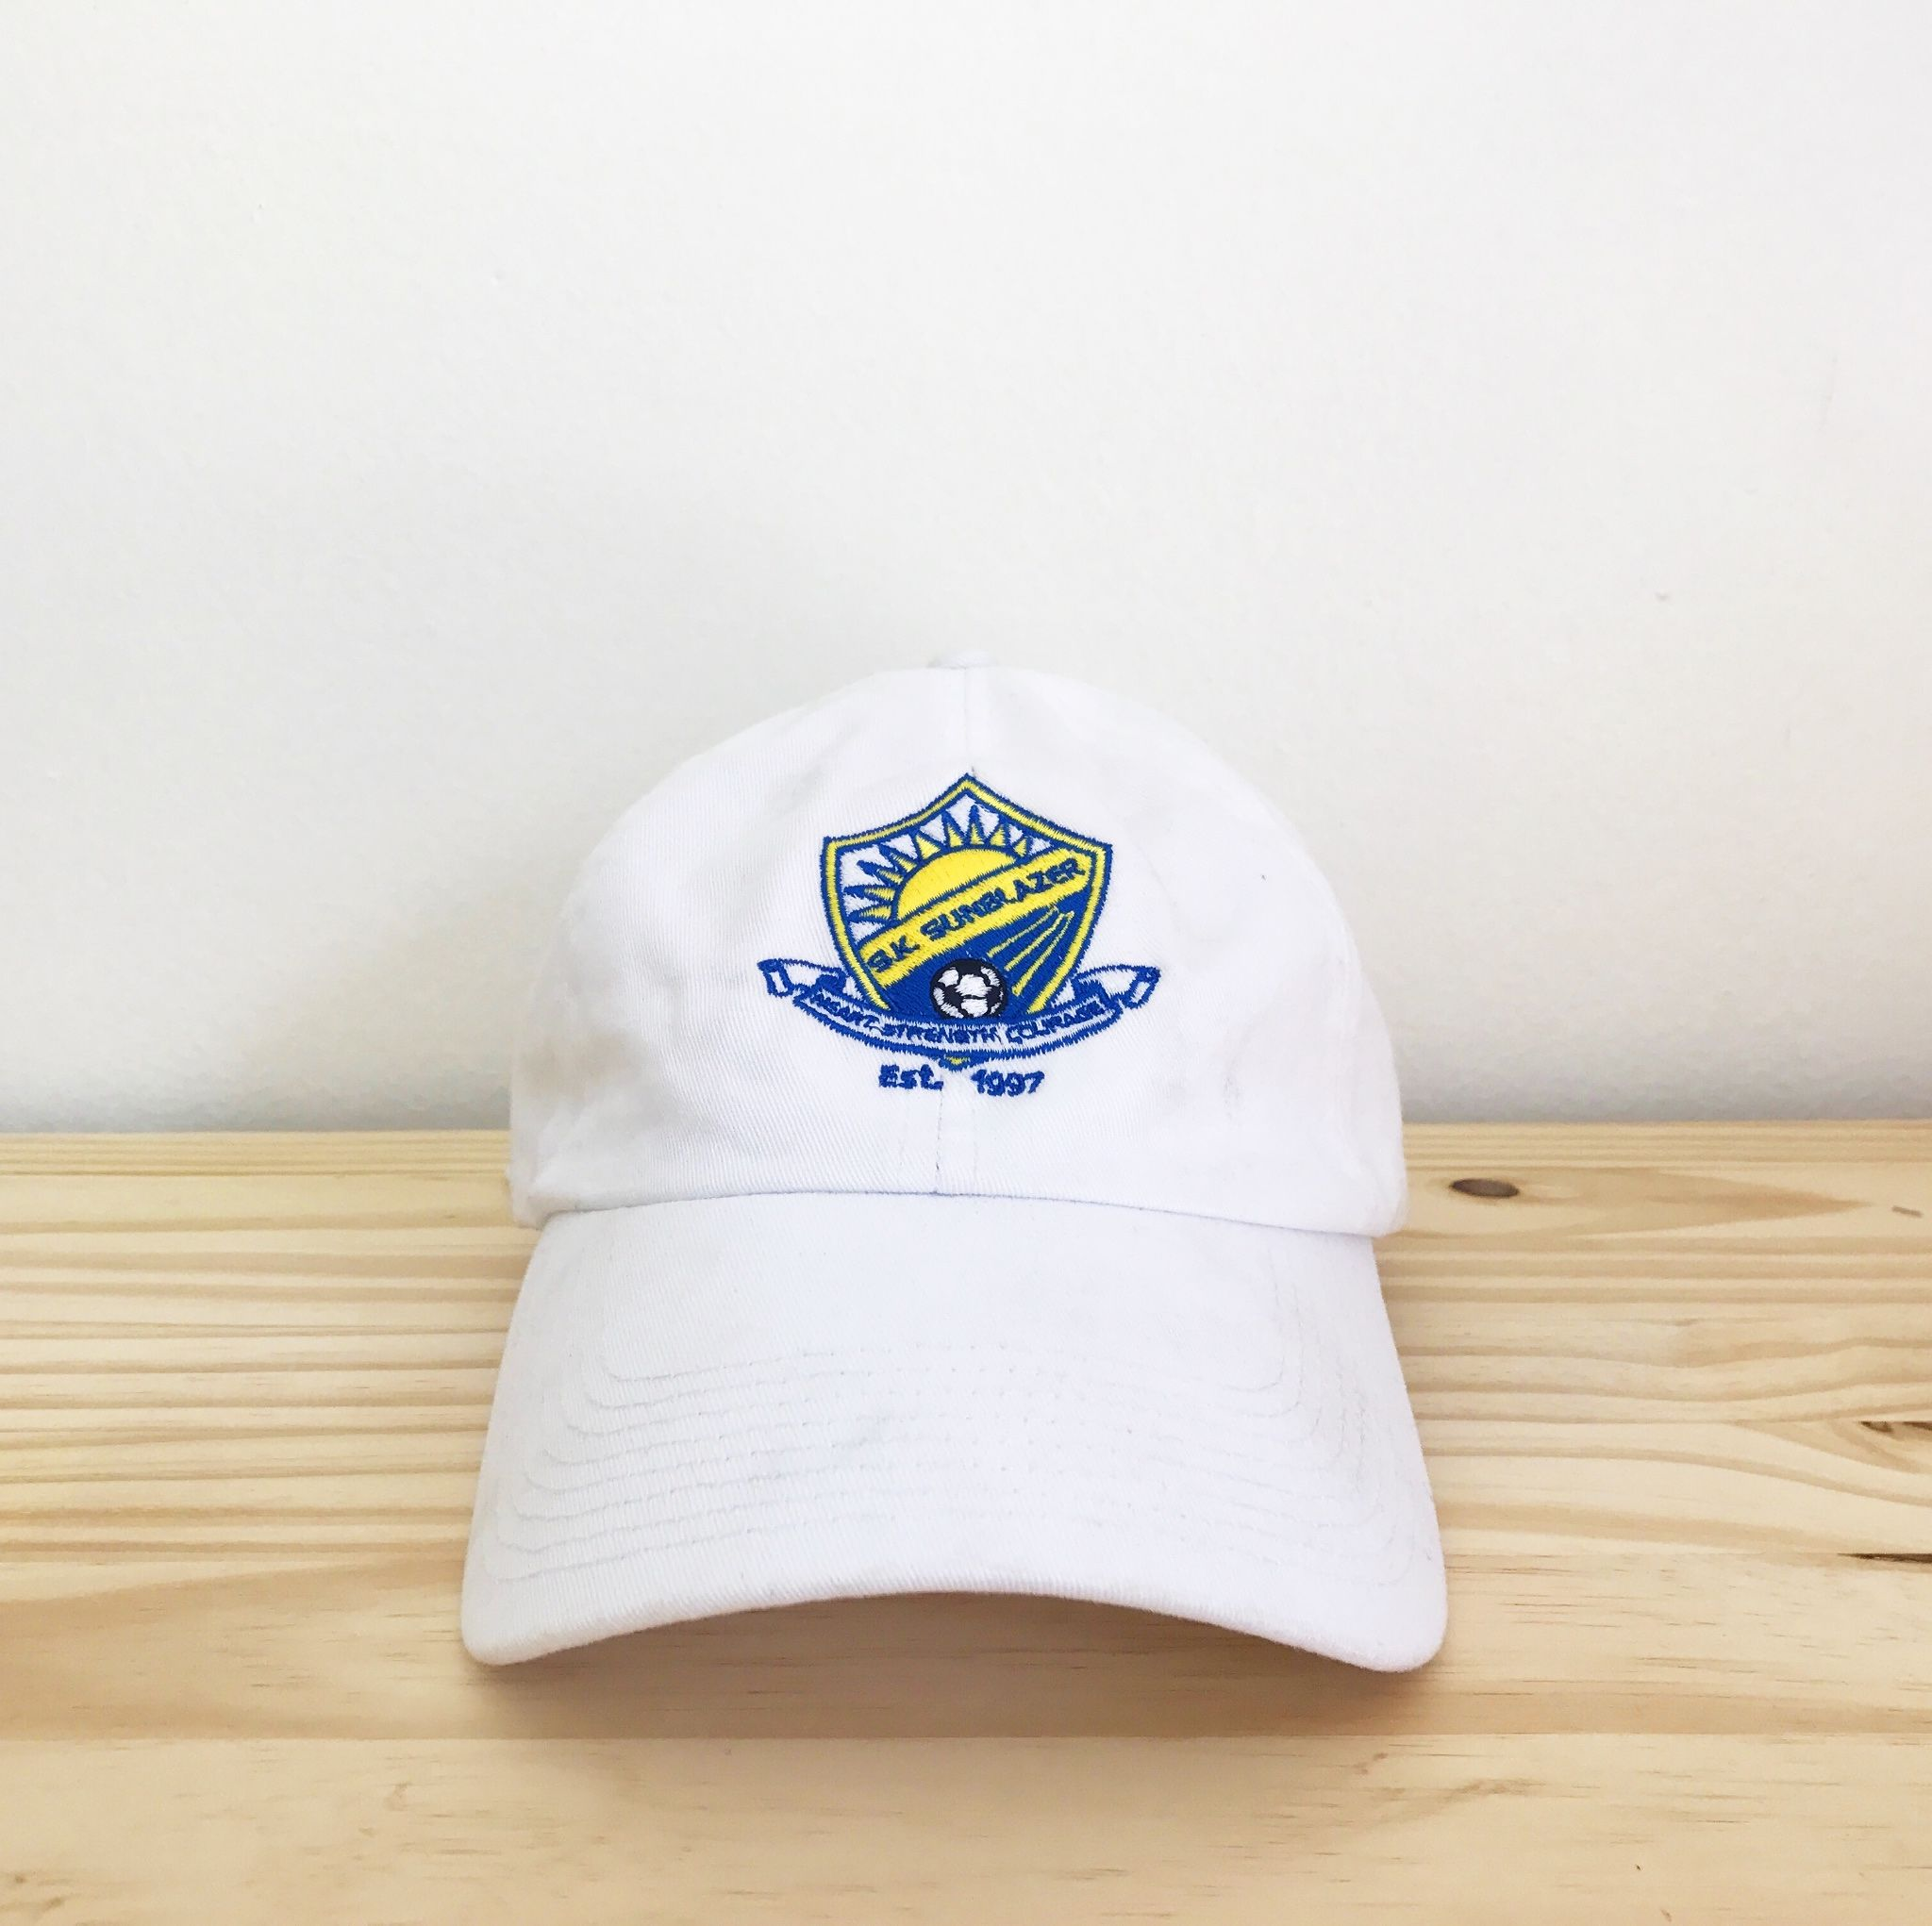 SK Sunblazer Cap